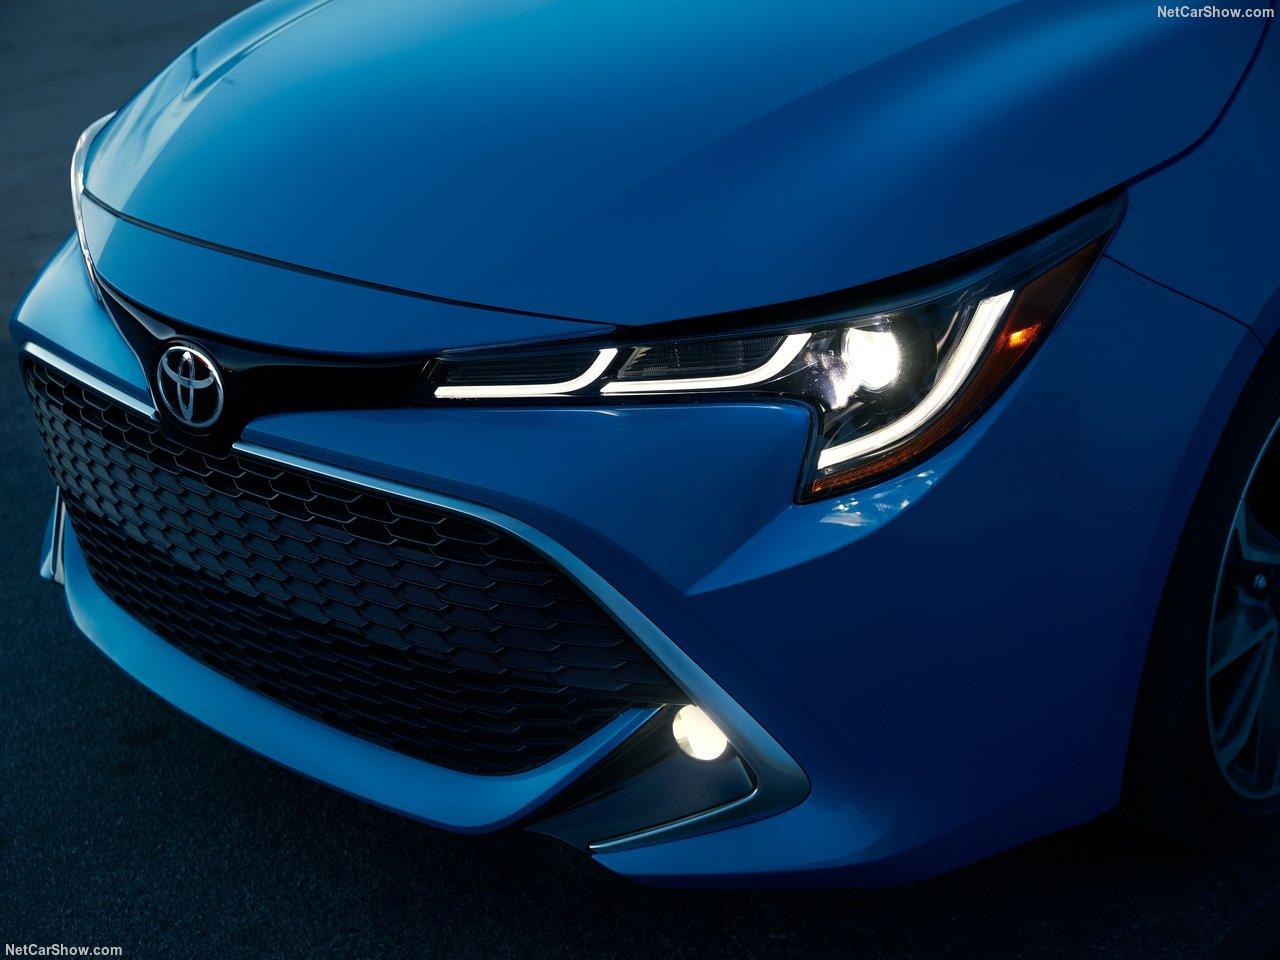 Toyota-Corolla_Hatchback-2019-1280-59.jpg